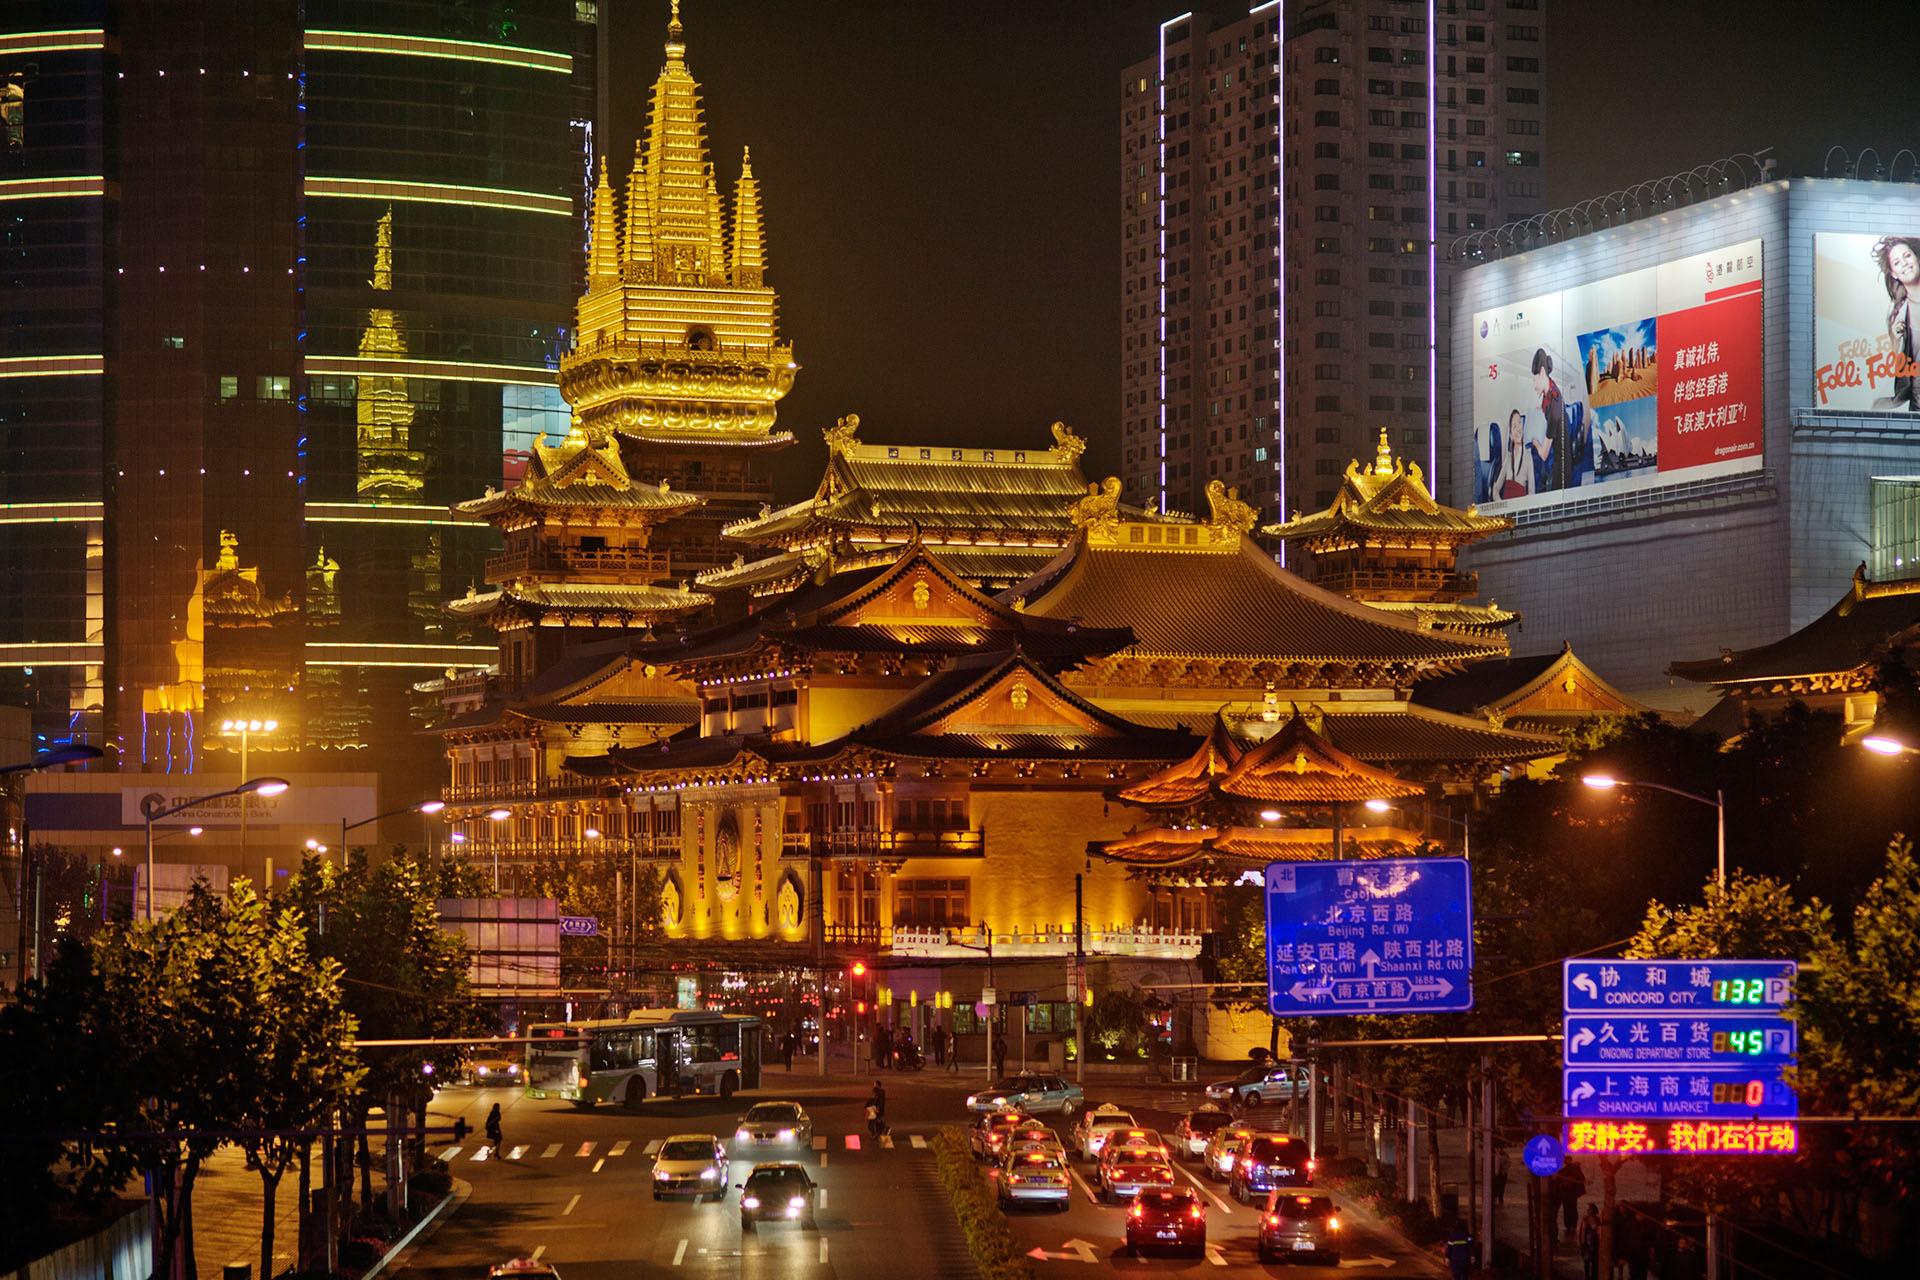 thesis statement about night life china